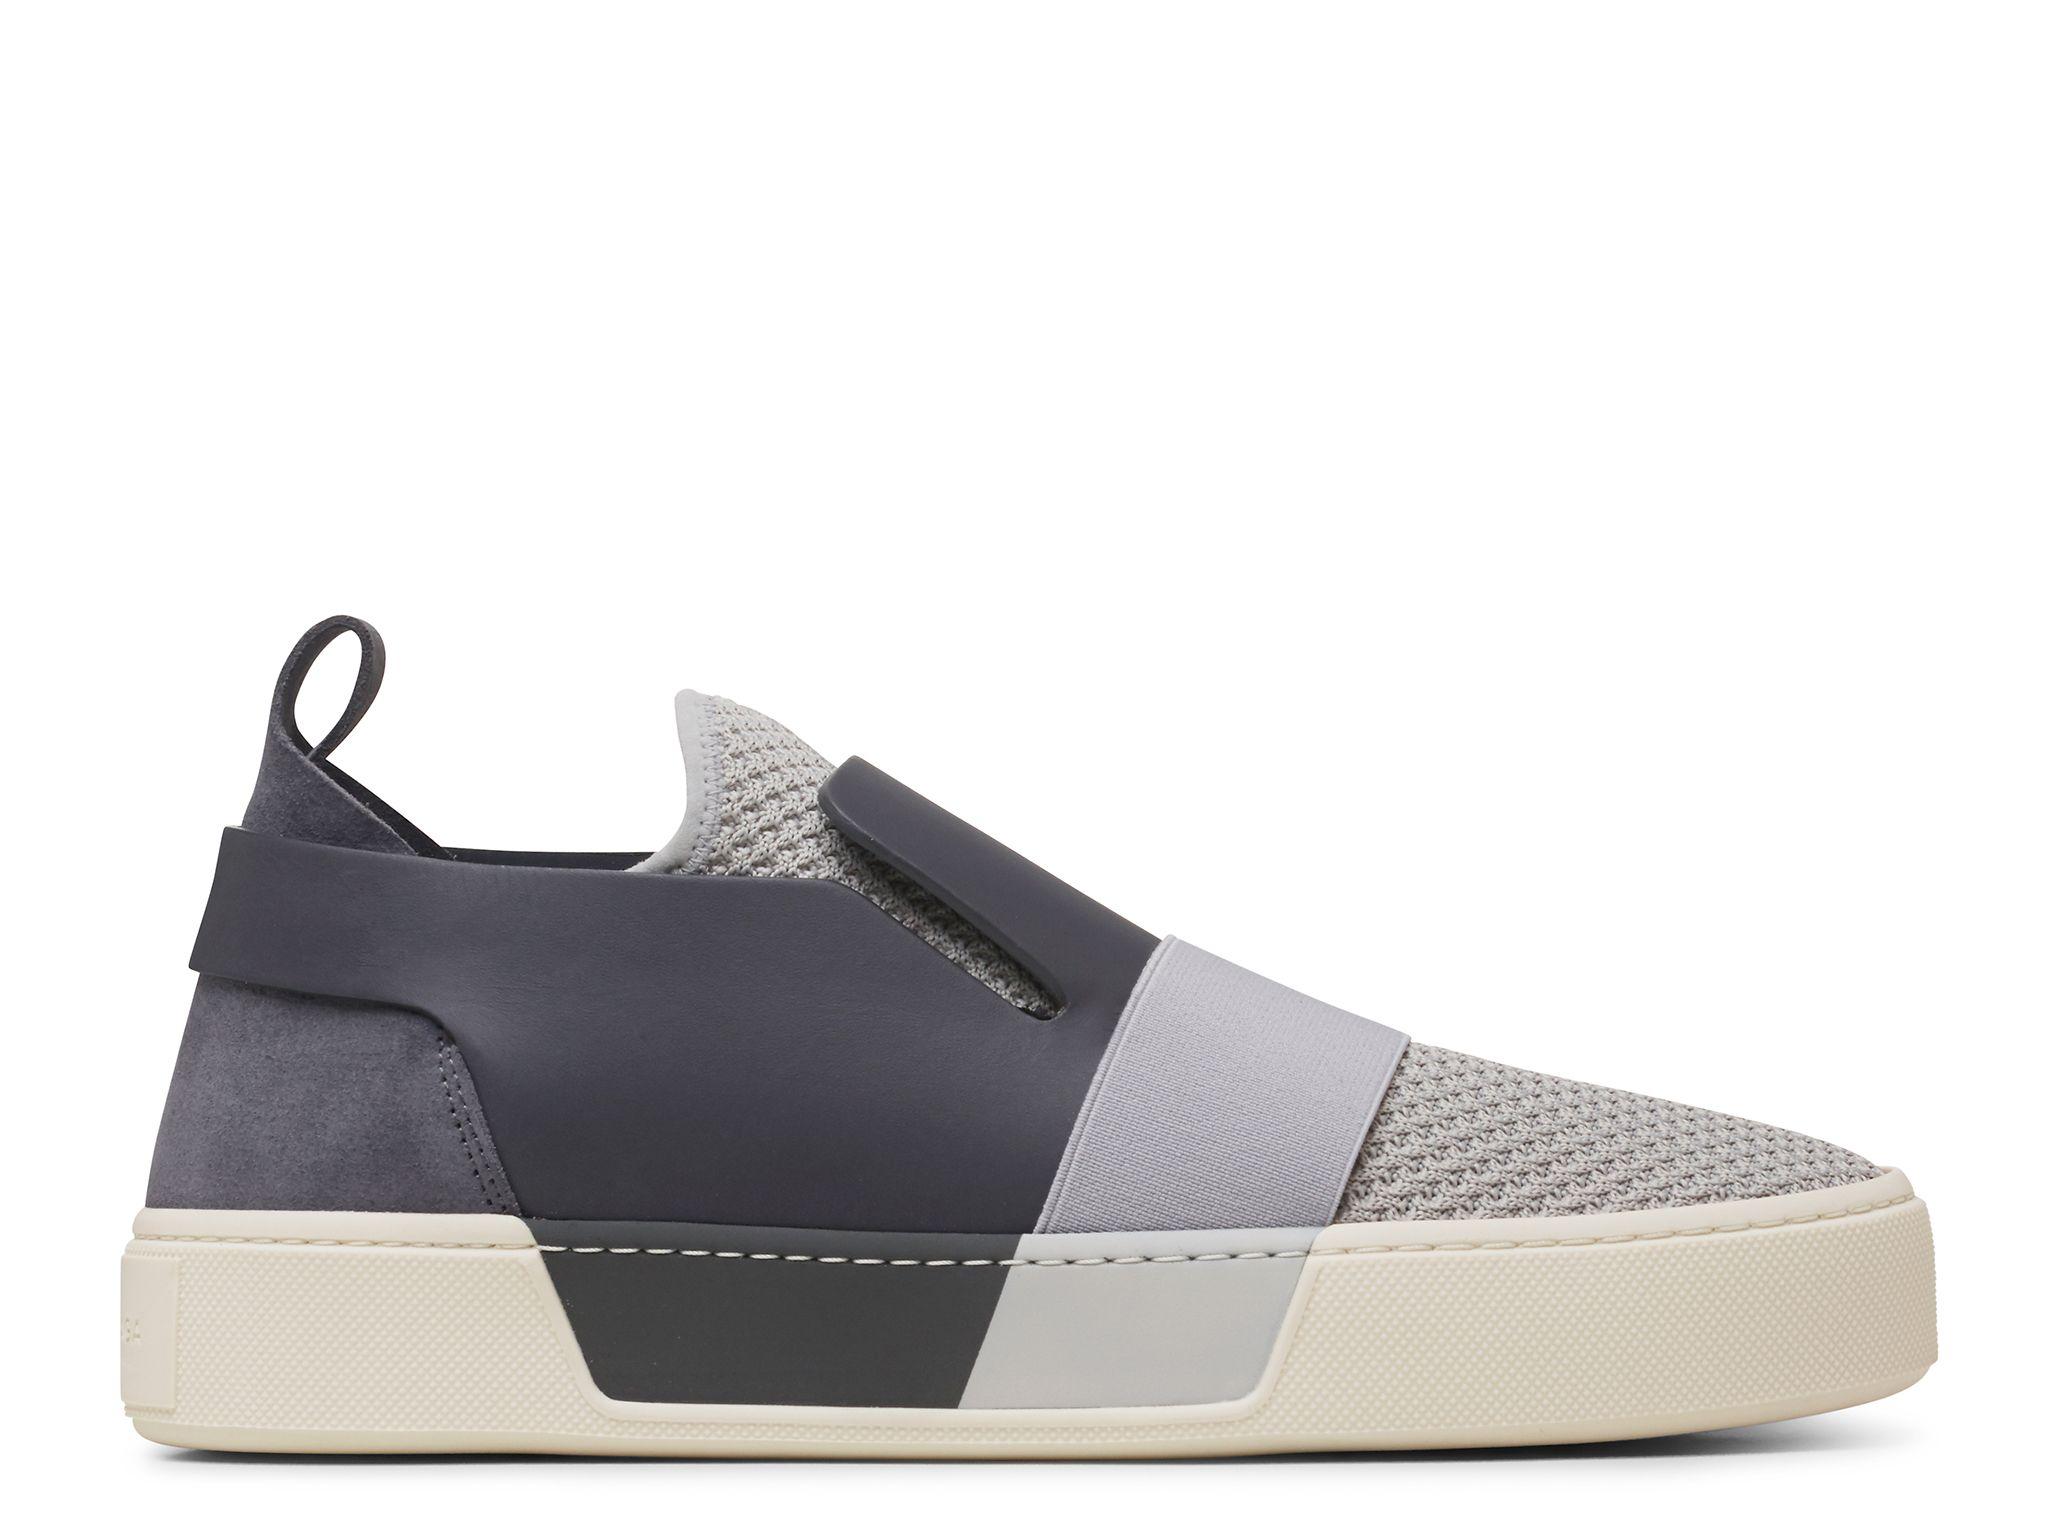 0989bde2ae54 Balenciaga Mens New Slip on knit - Sneakerboy